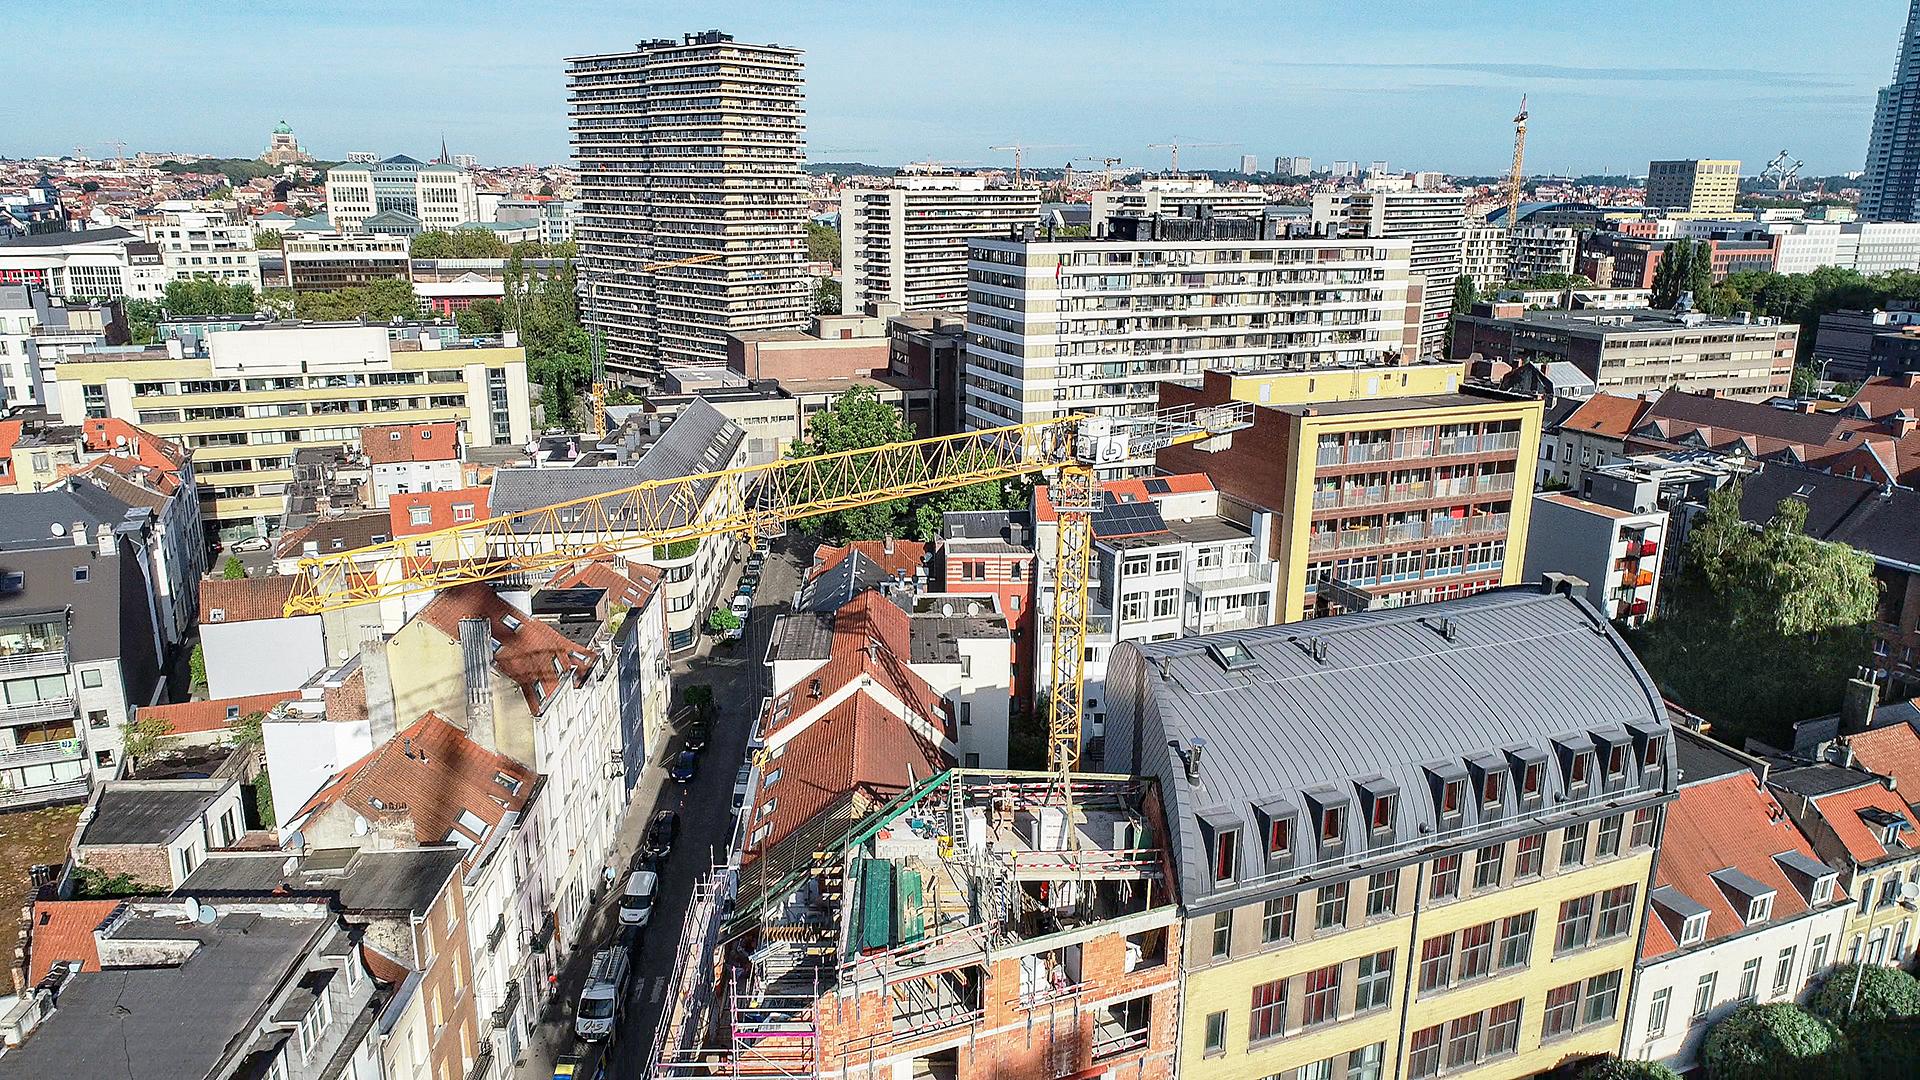 Brussel-Harmoniestraat3.5_Still026-HD